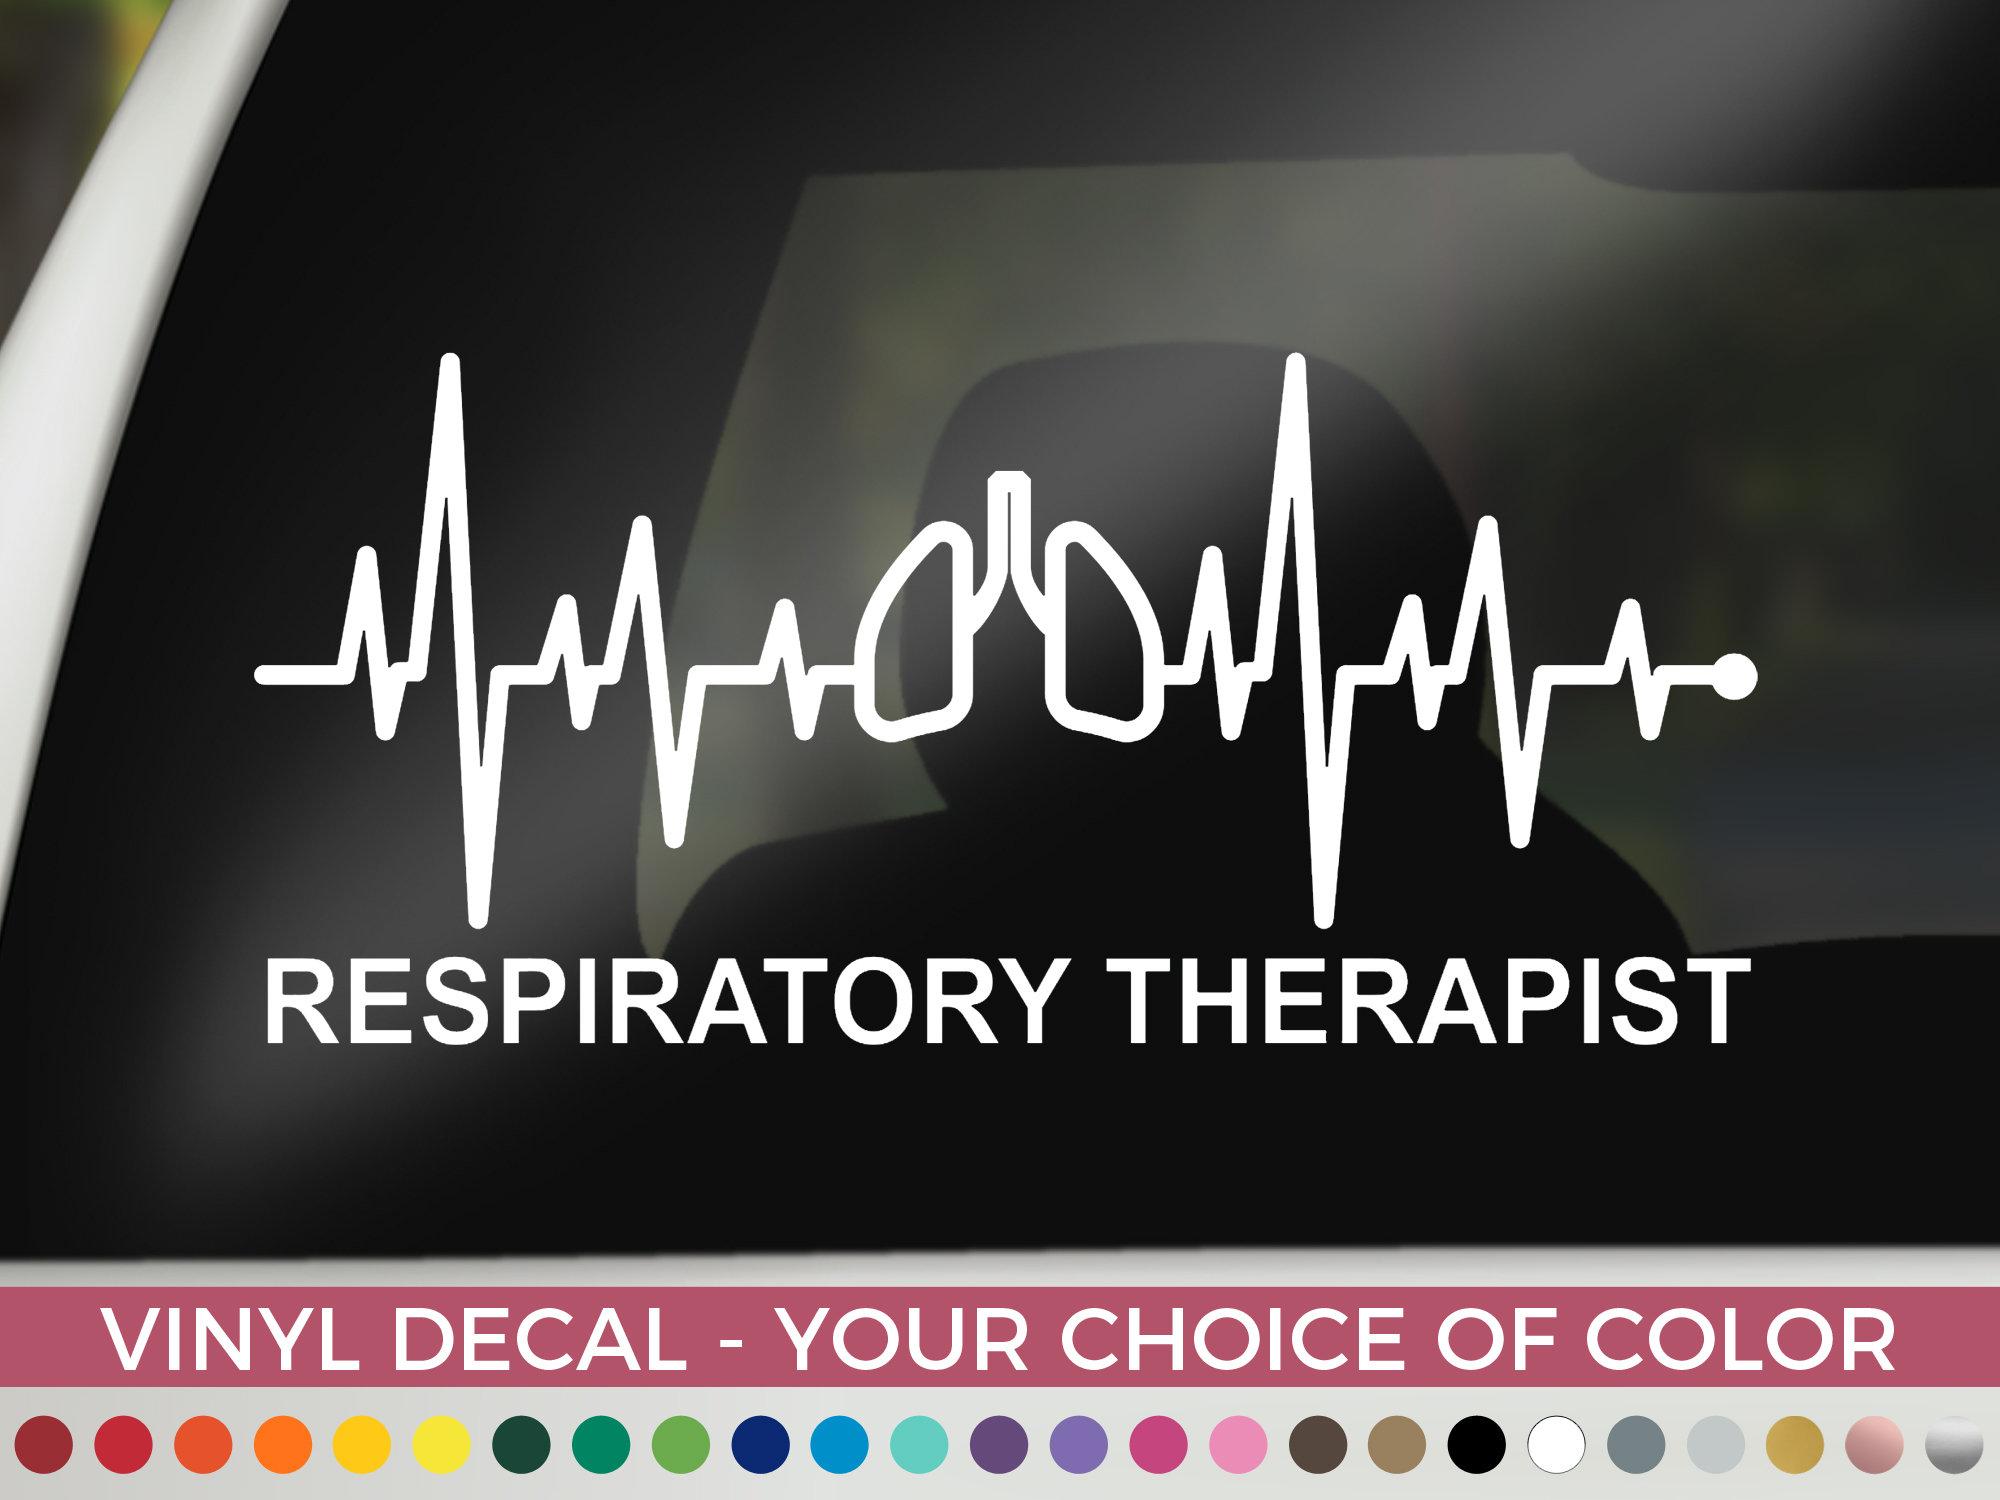 Respiratory Therapist RN Nurse Reflective or Matte vinyl decal Sticker